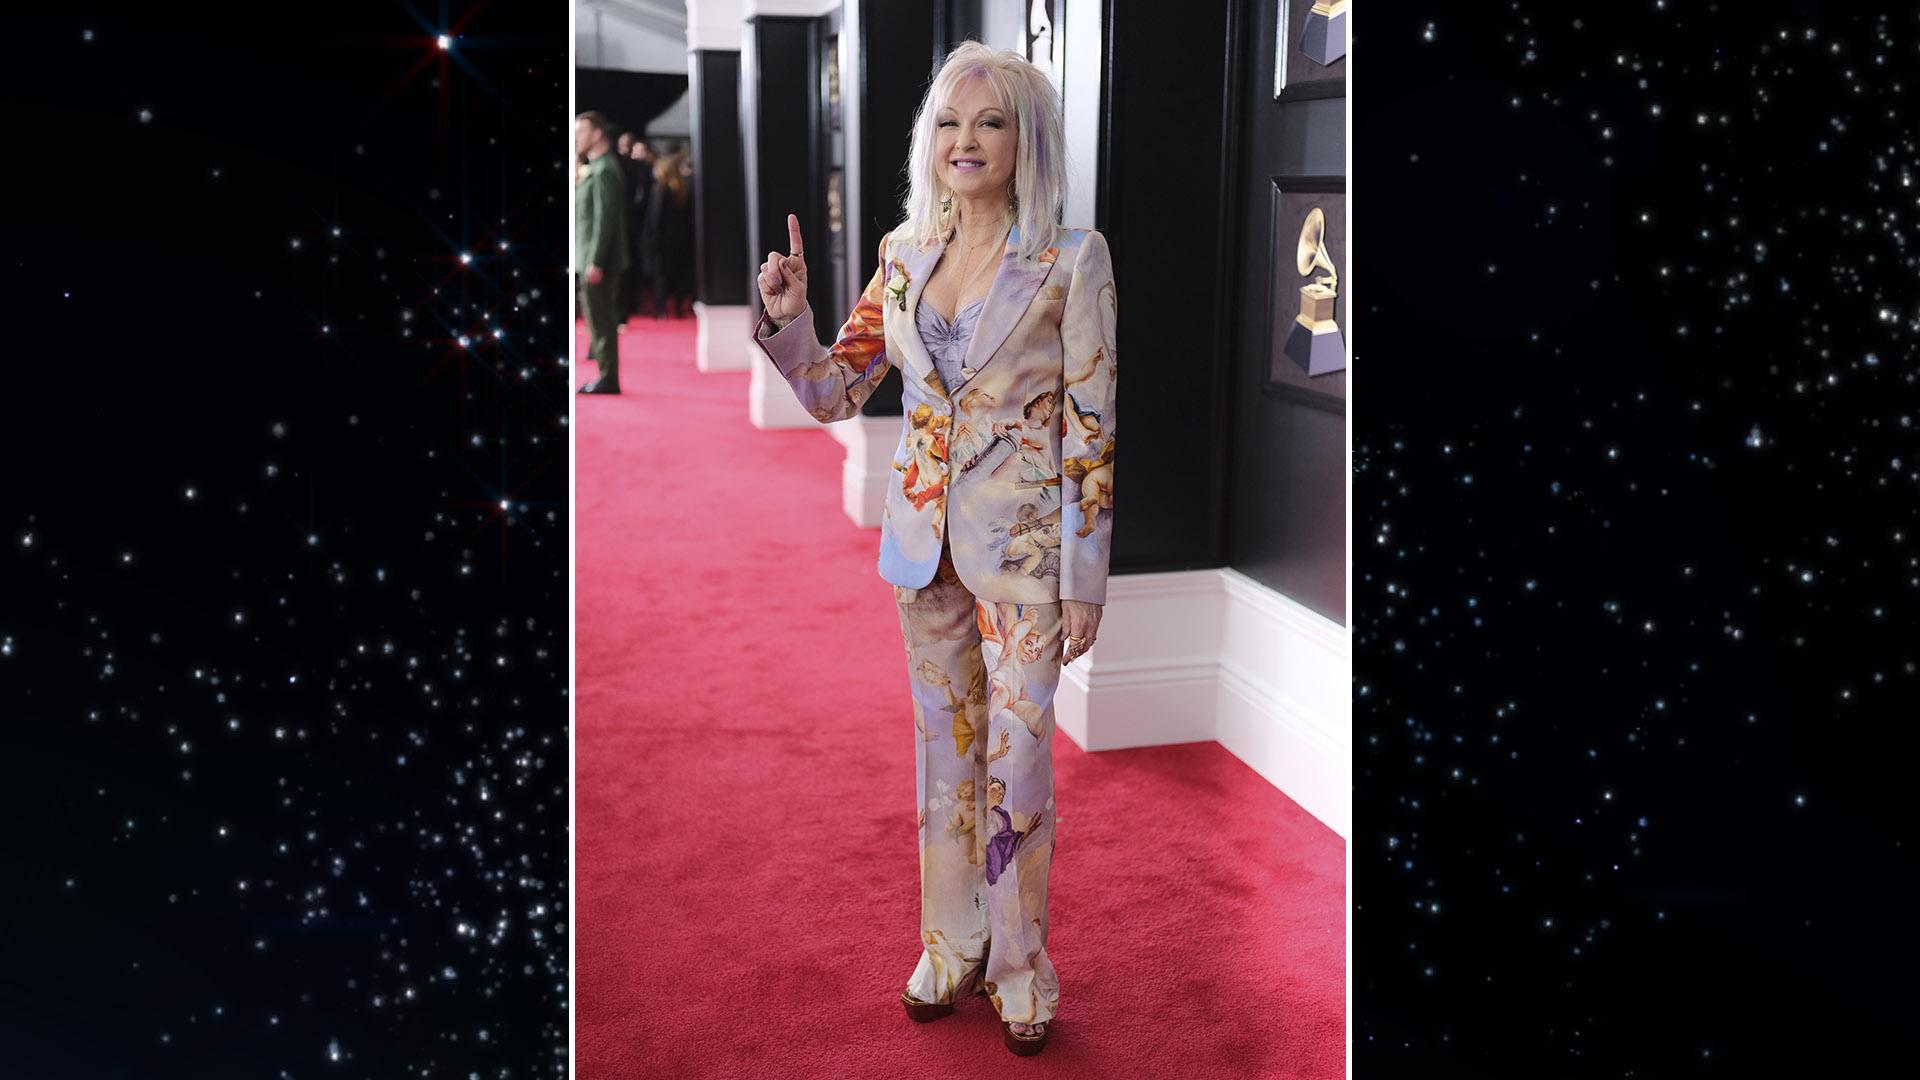 Pop legend Cyndi Lauper showed her